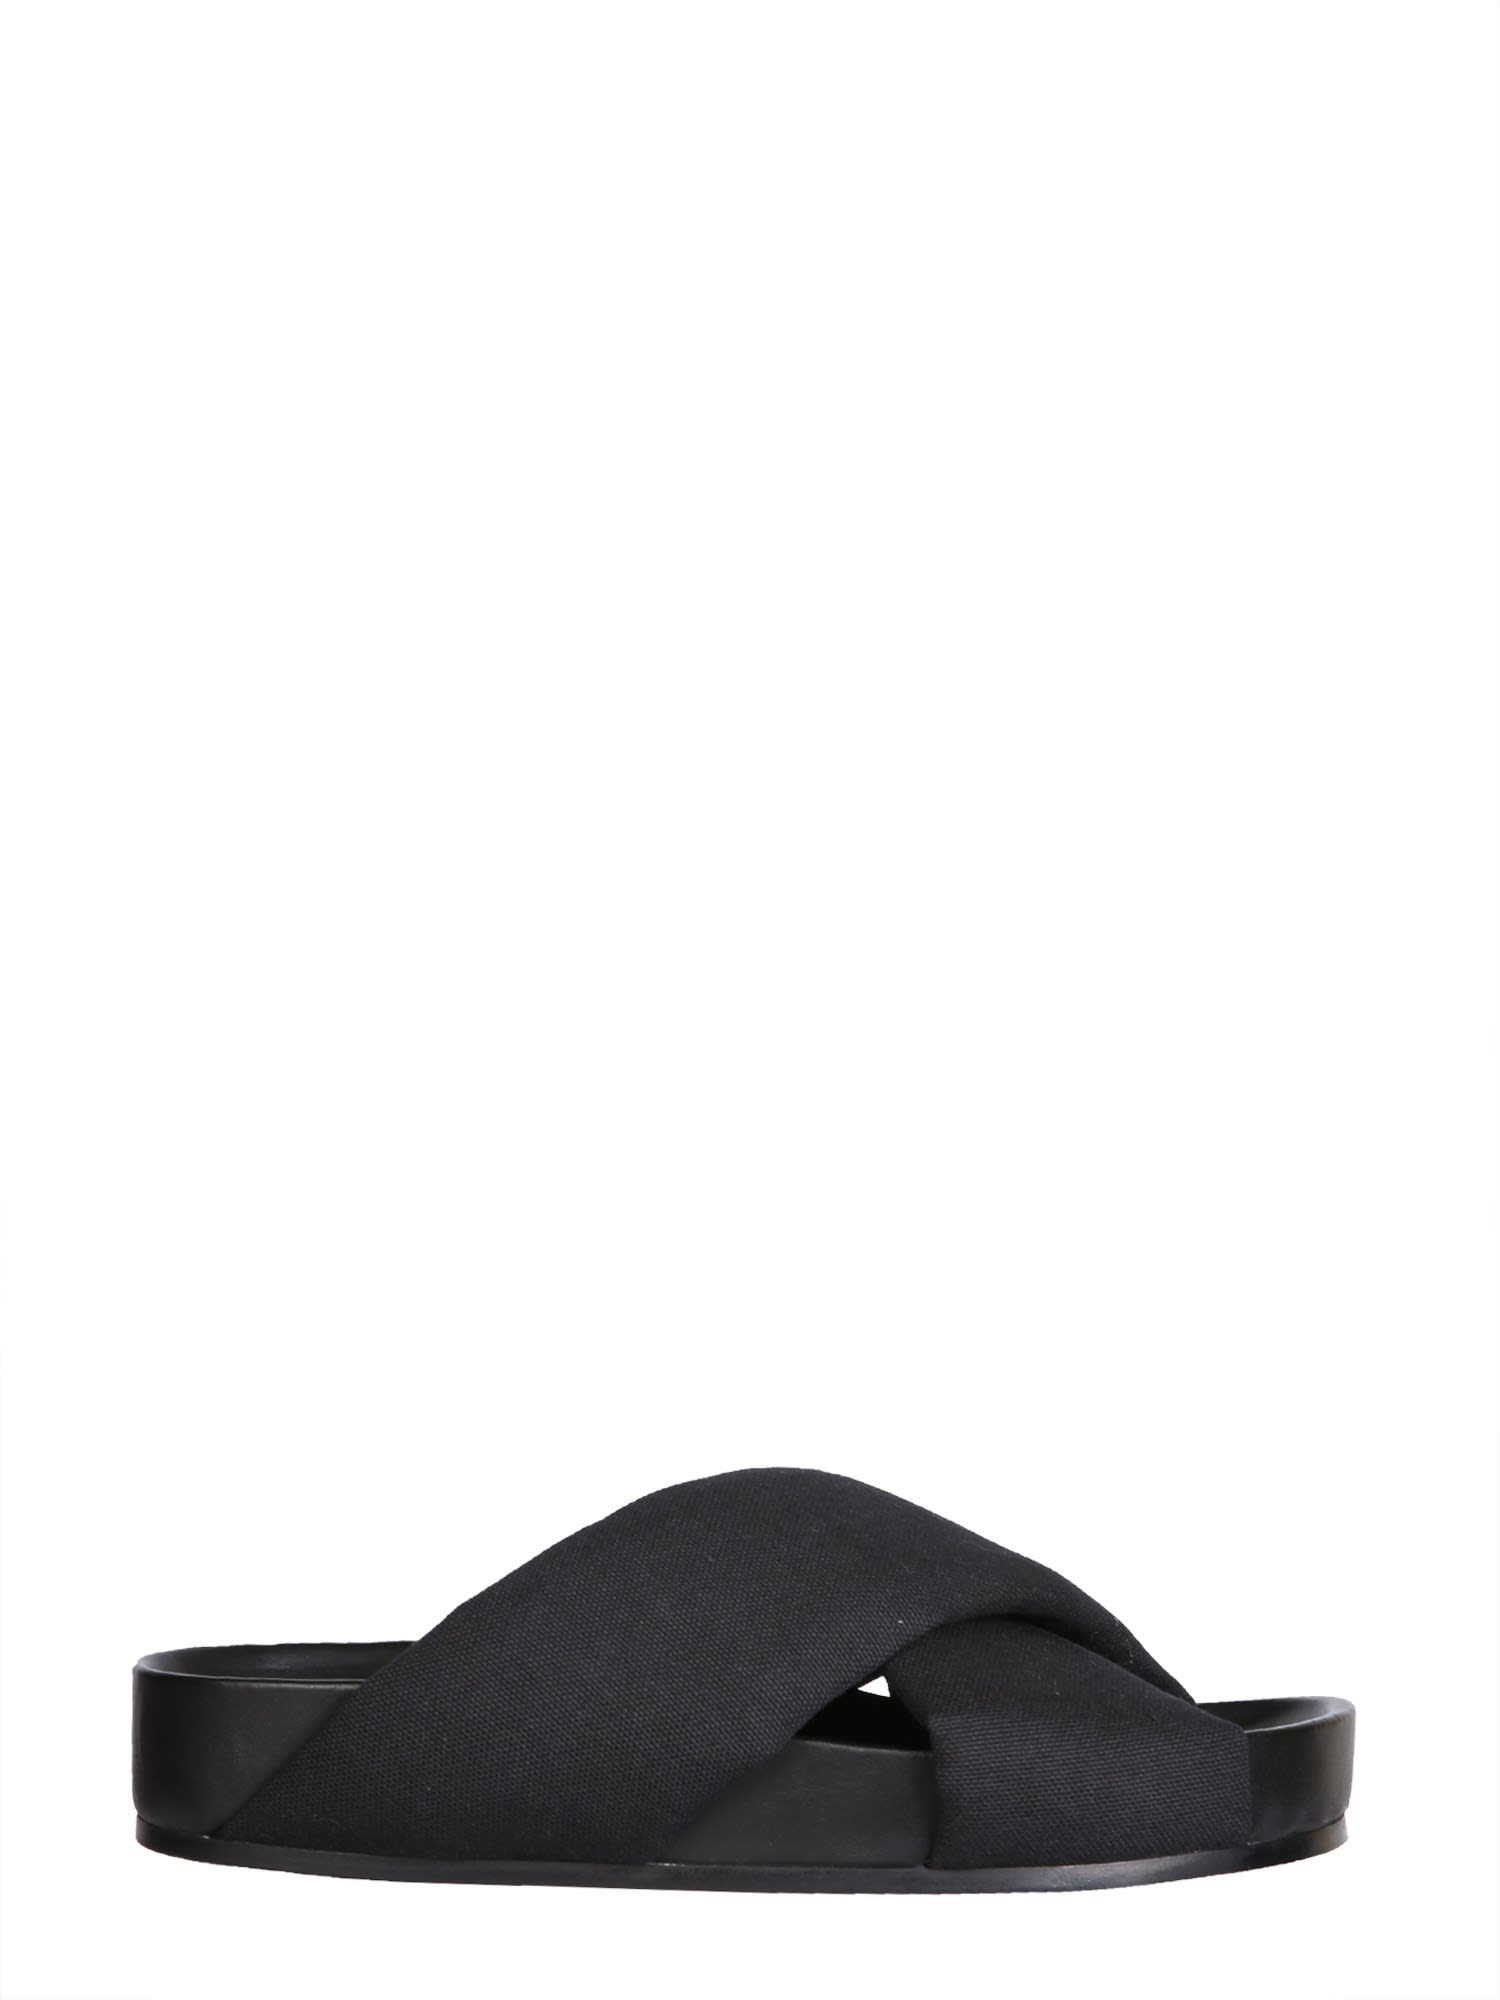 Buy Jil Sander Crossover Sandals online, shop Jil Sander shoes with free shipping